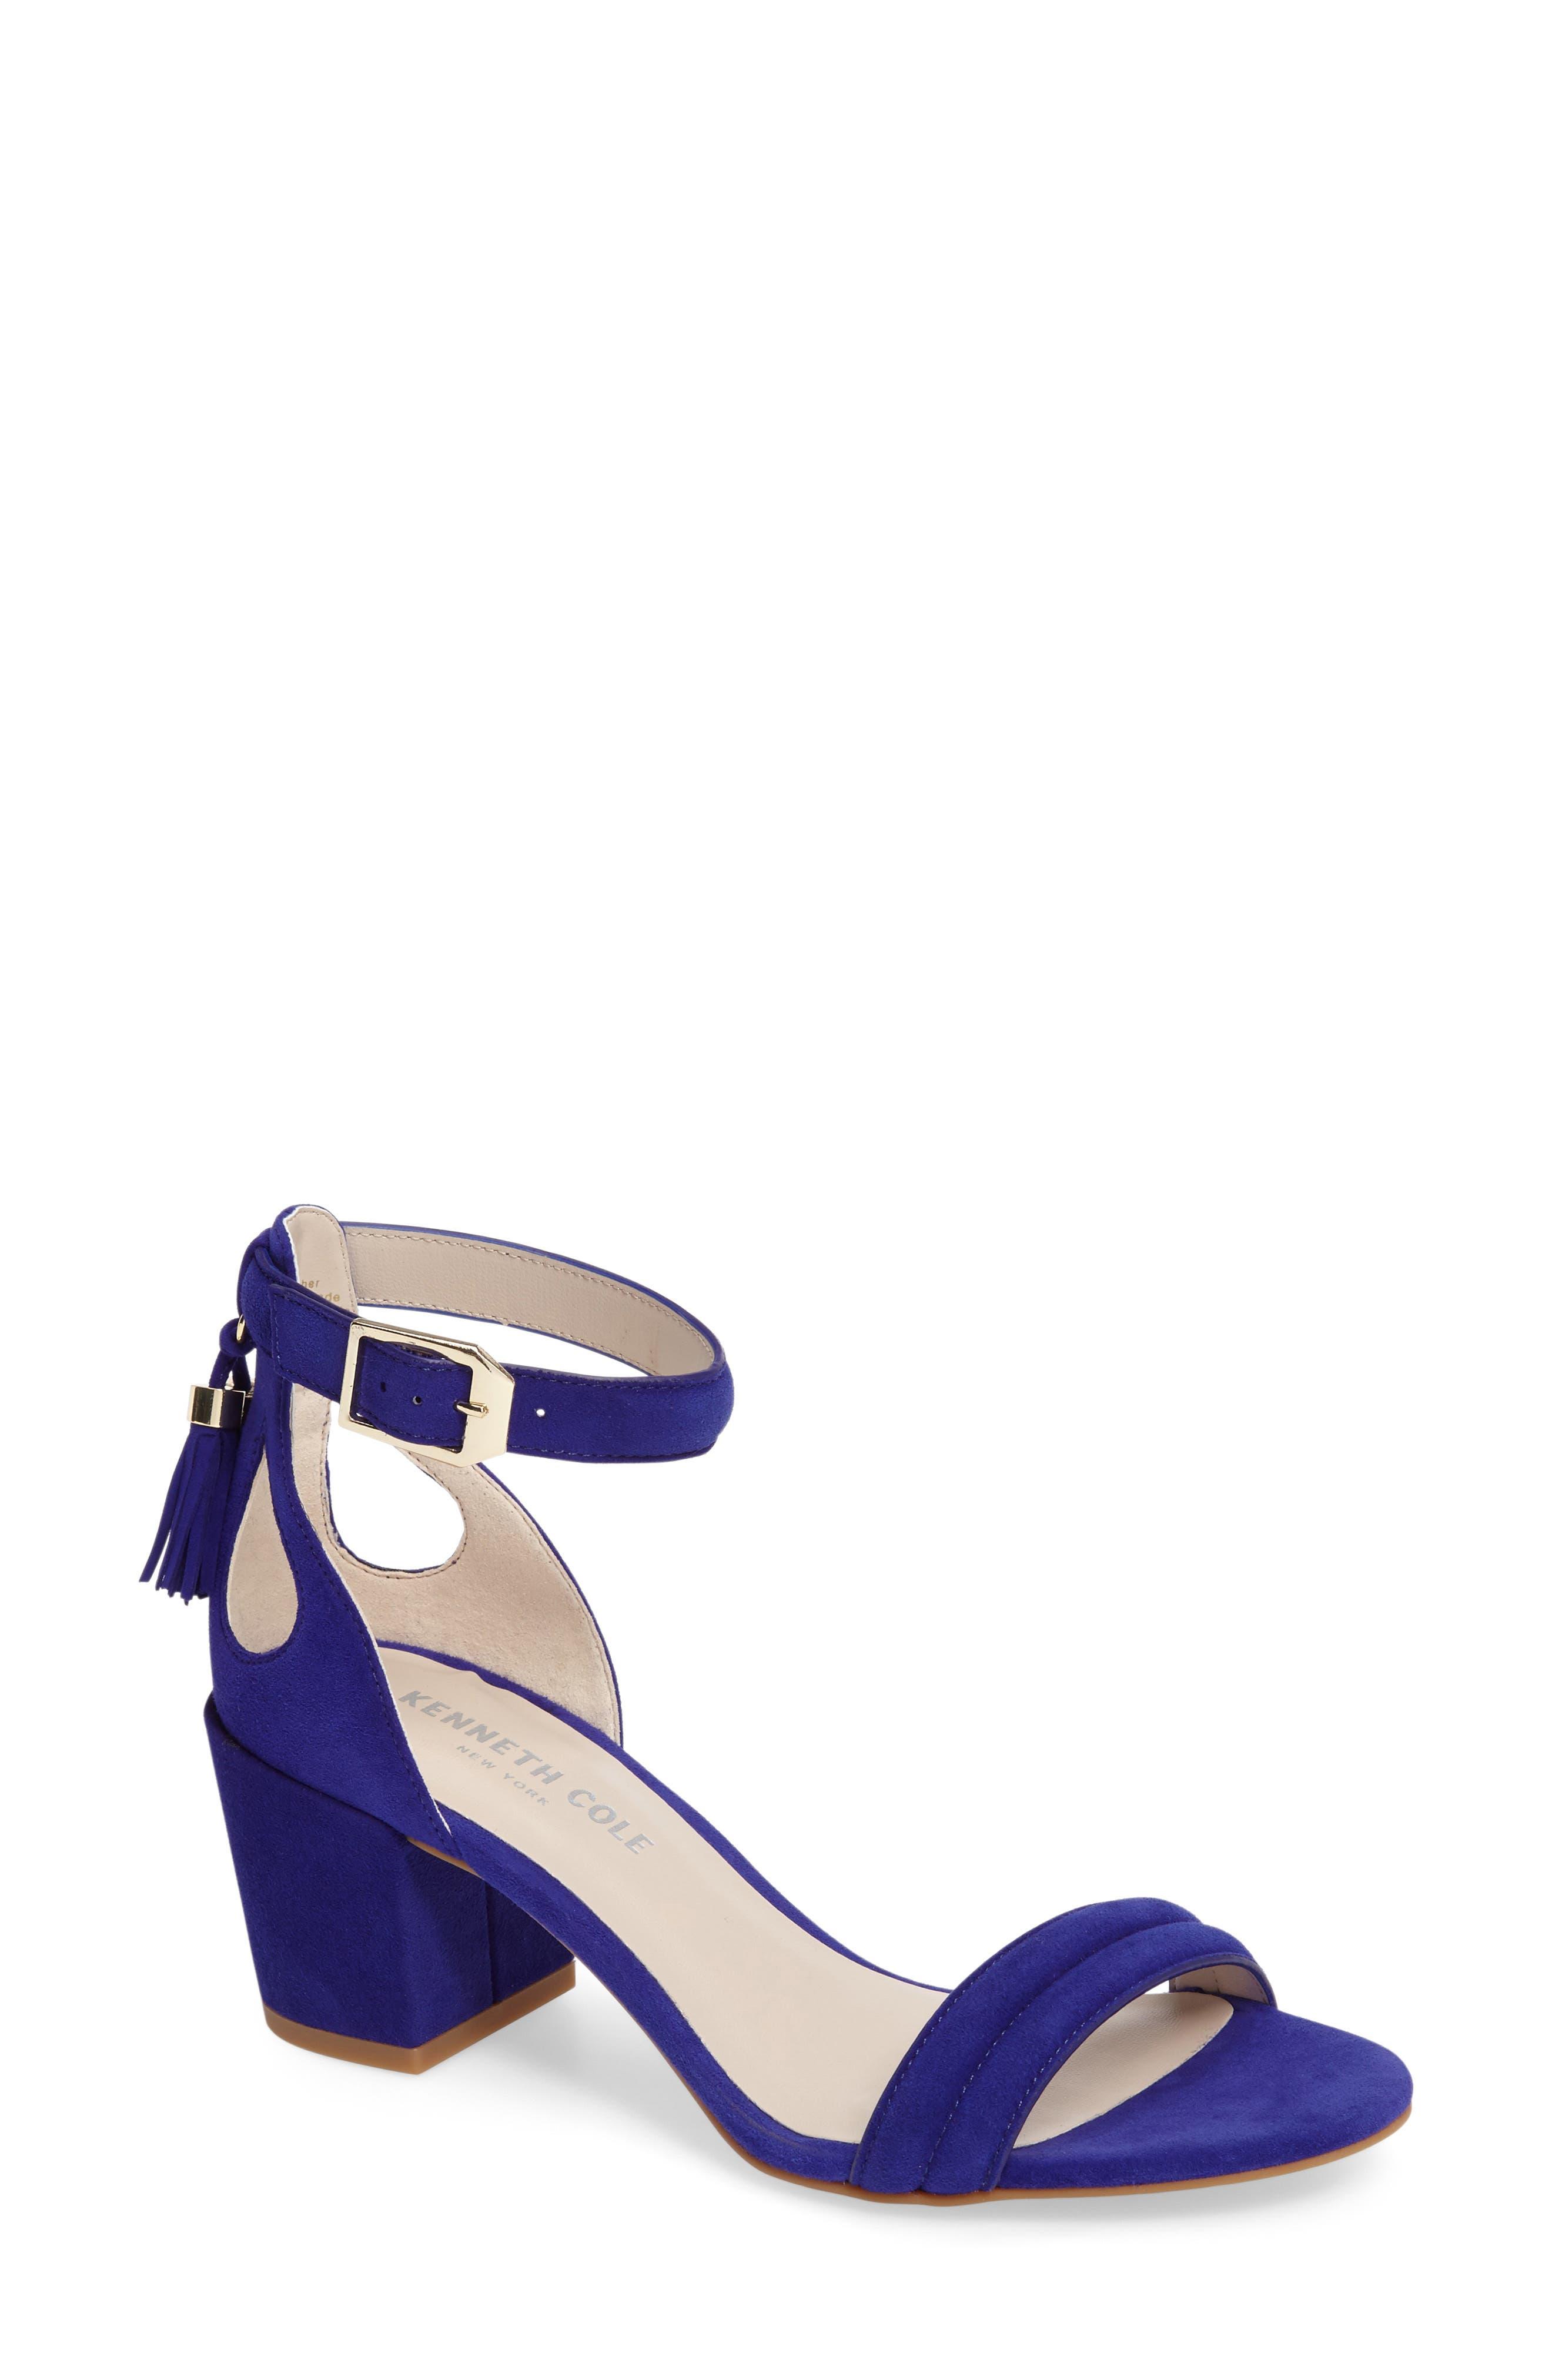 Alternate Image 1 Selected - Kenneth Cole Harriet Ankle Strap Sandal (Women)